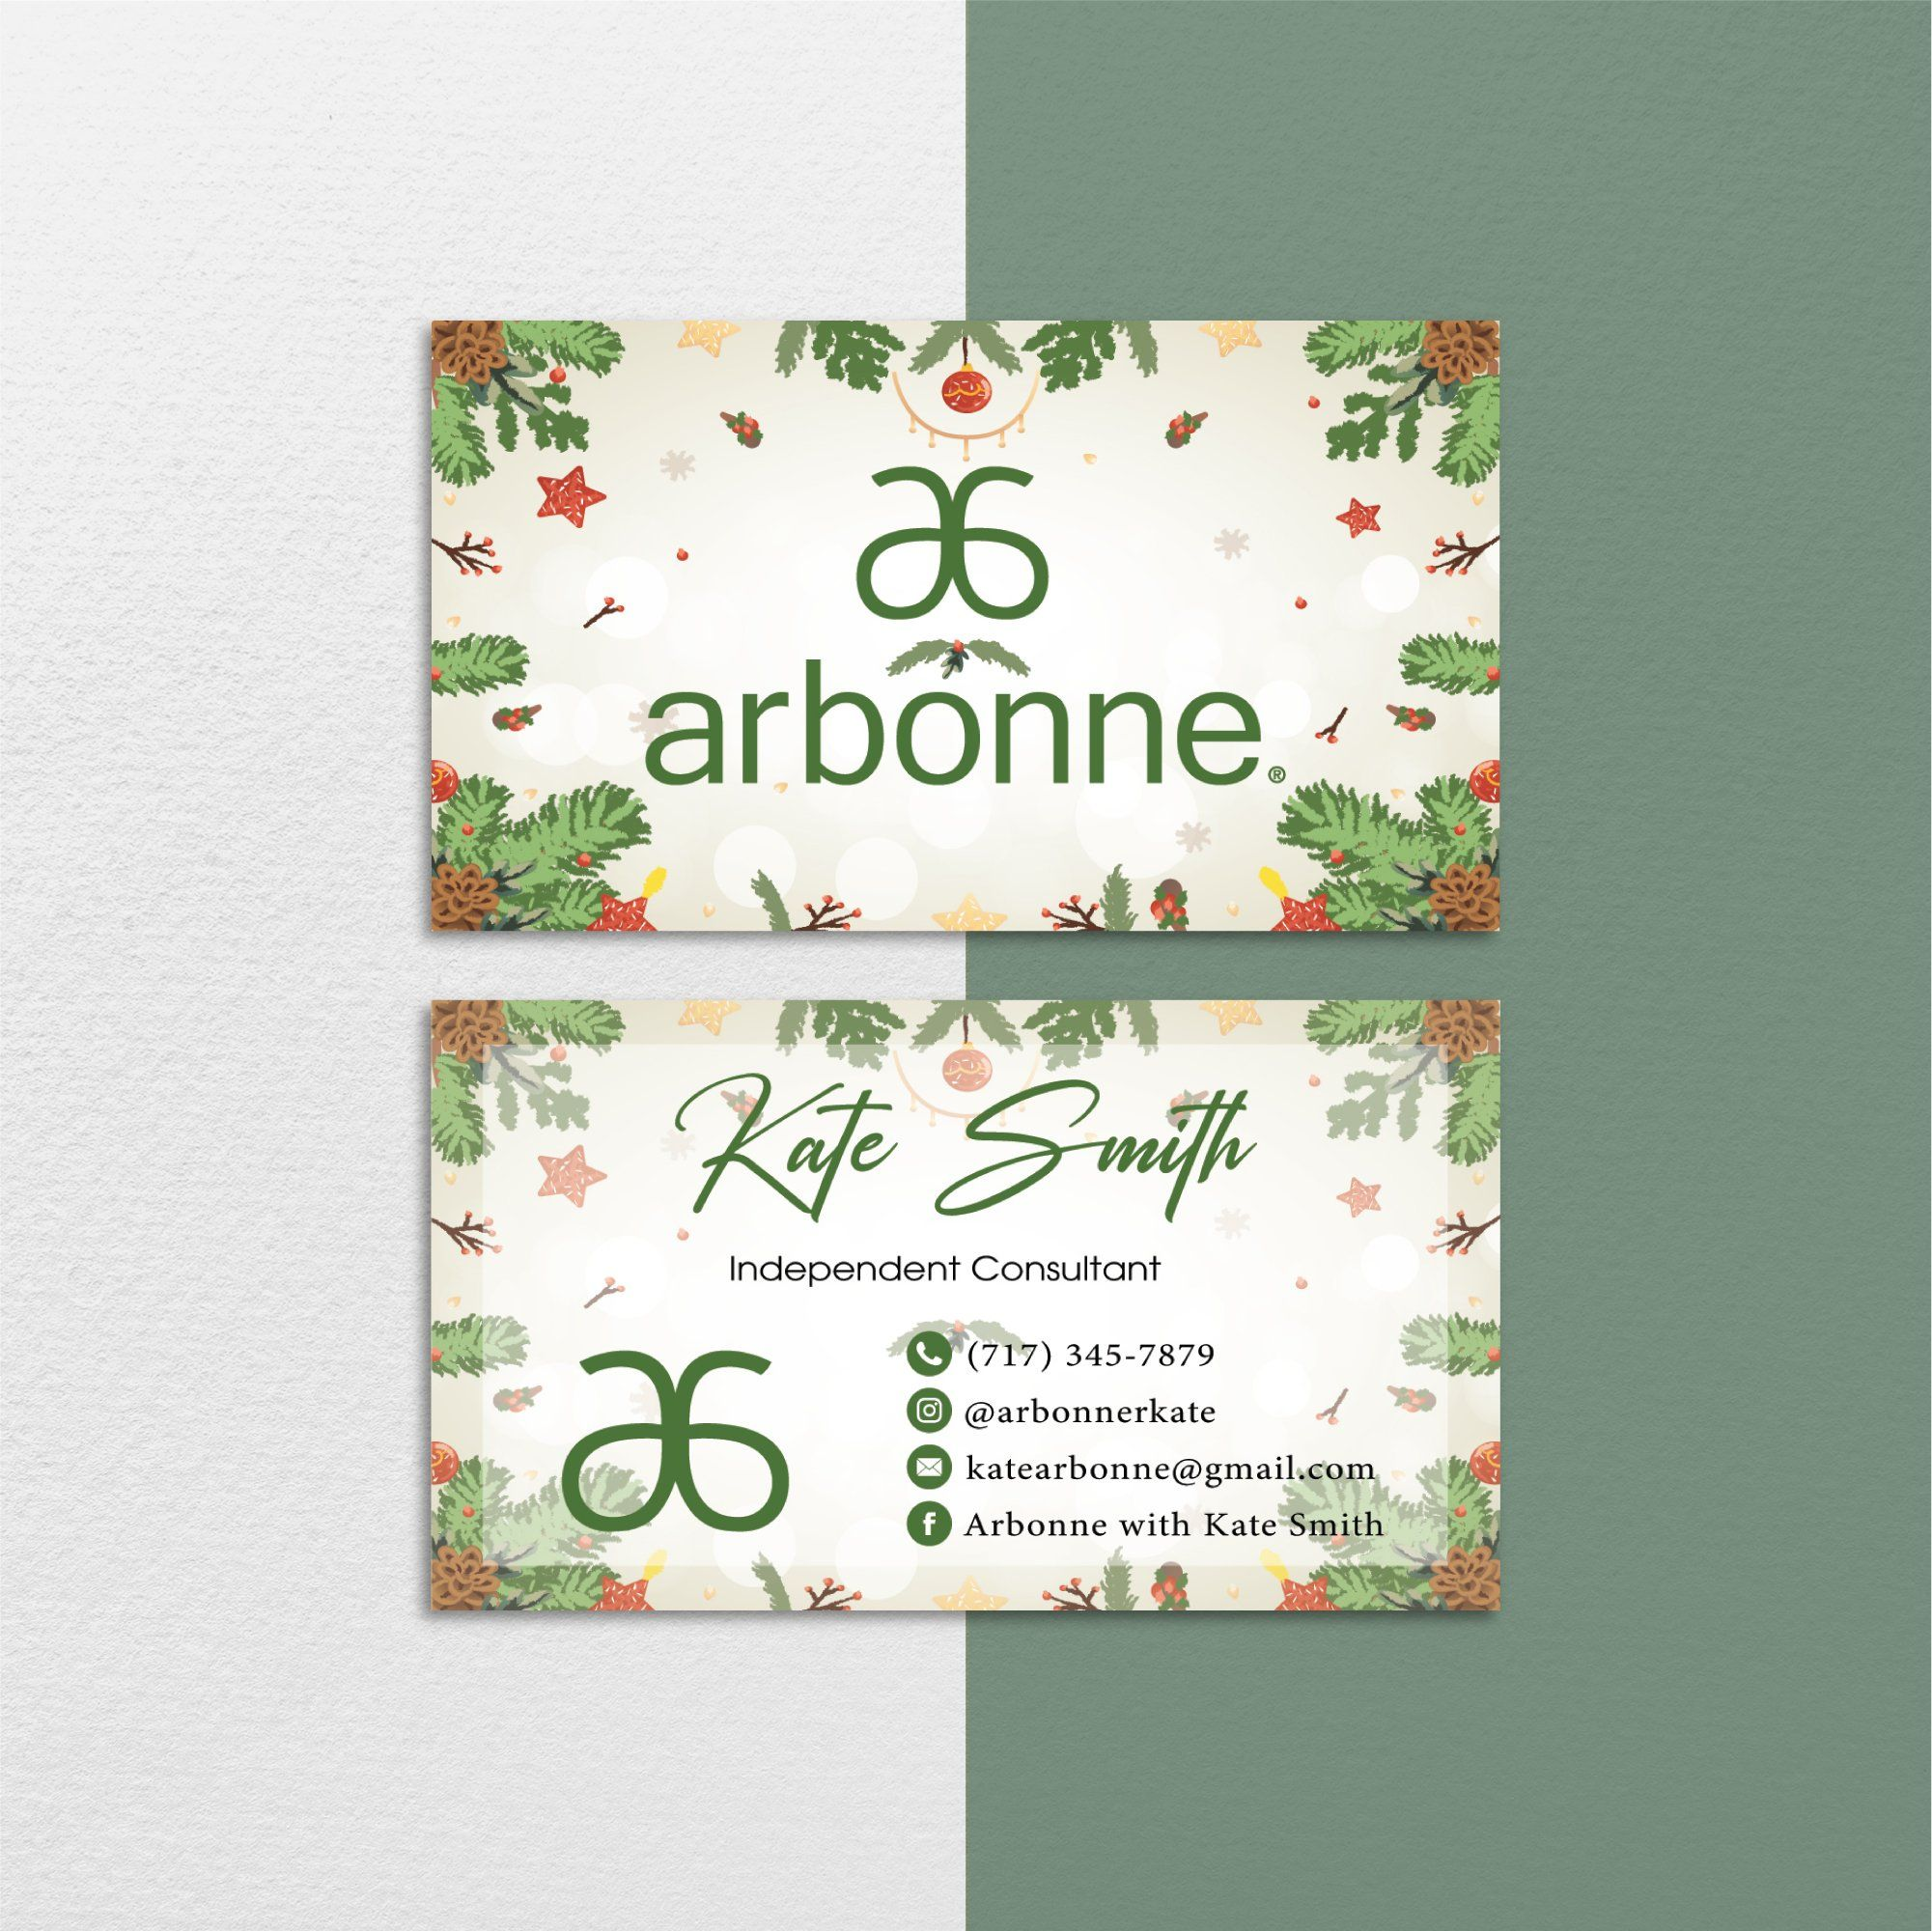 Christmas Arbonne Business Cards Christmas Personalized Arbonne Cards Ab144 Arbonne Business Cards Personalized Christmas Card Design